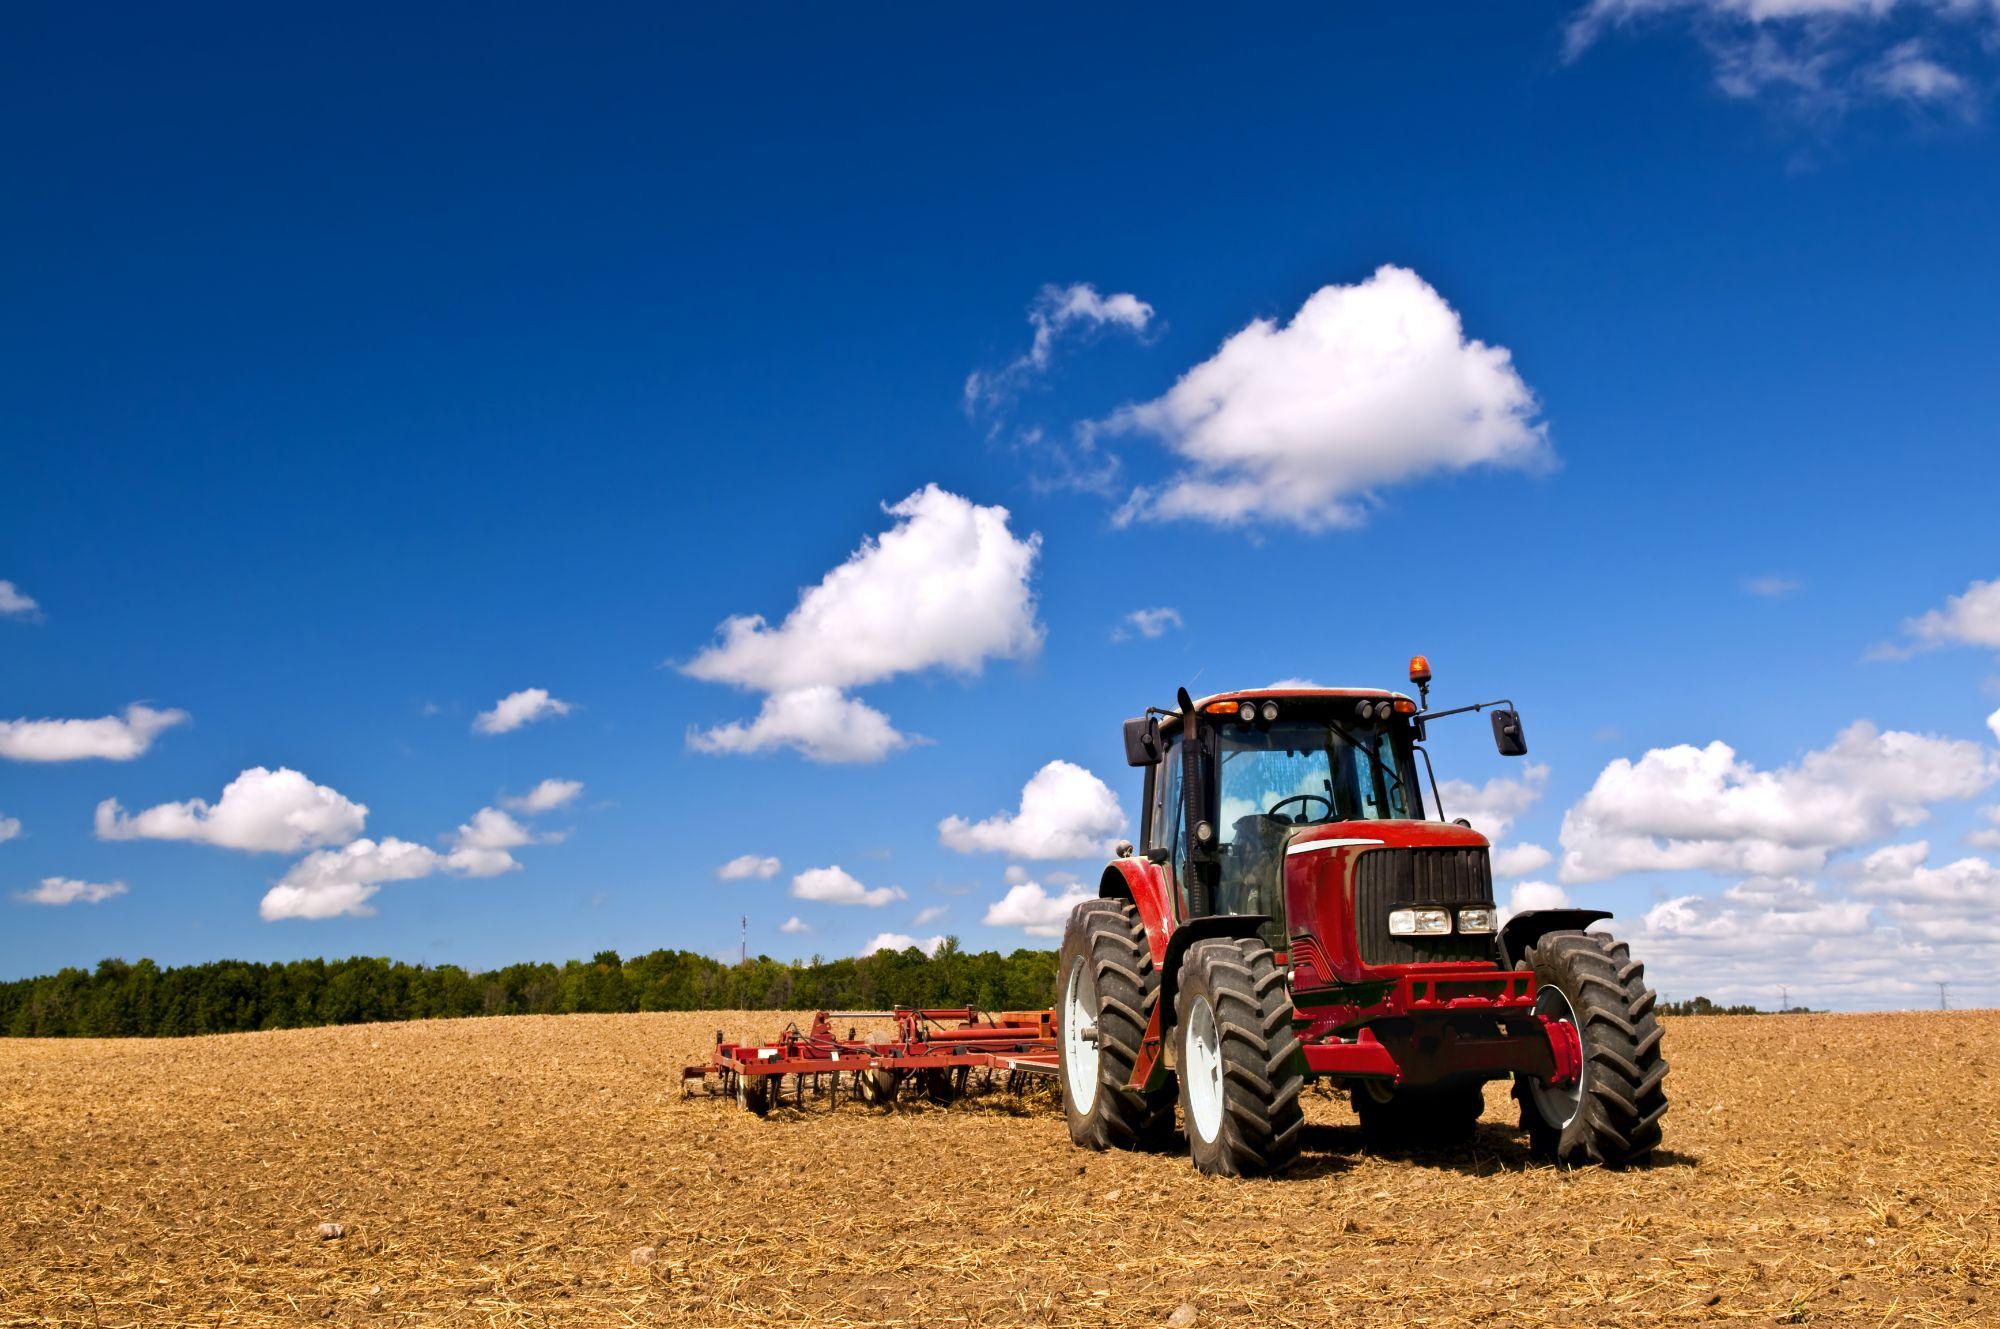 red tractor massey ferguson